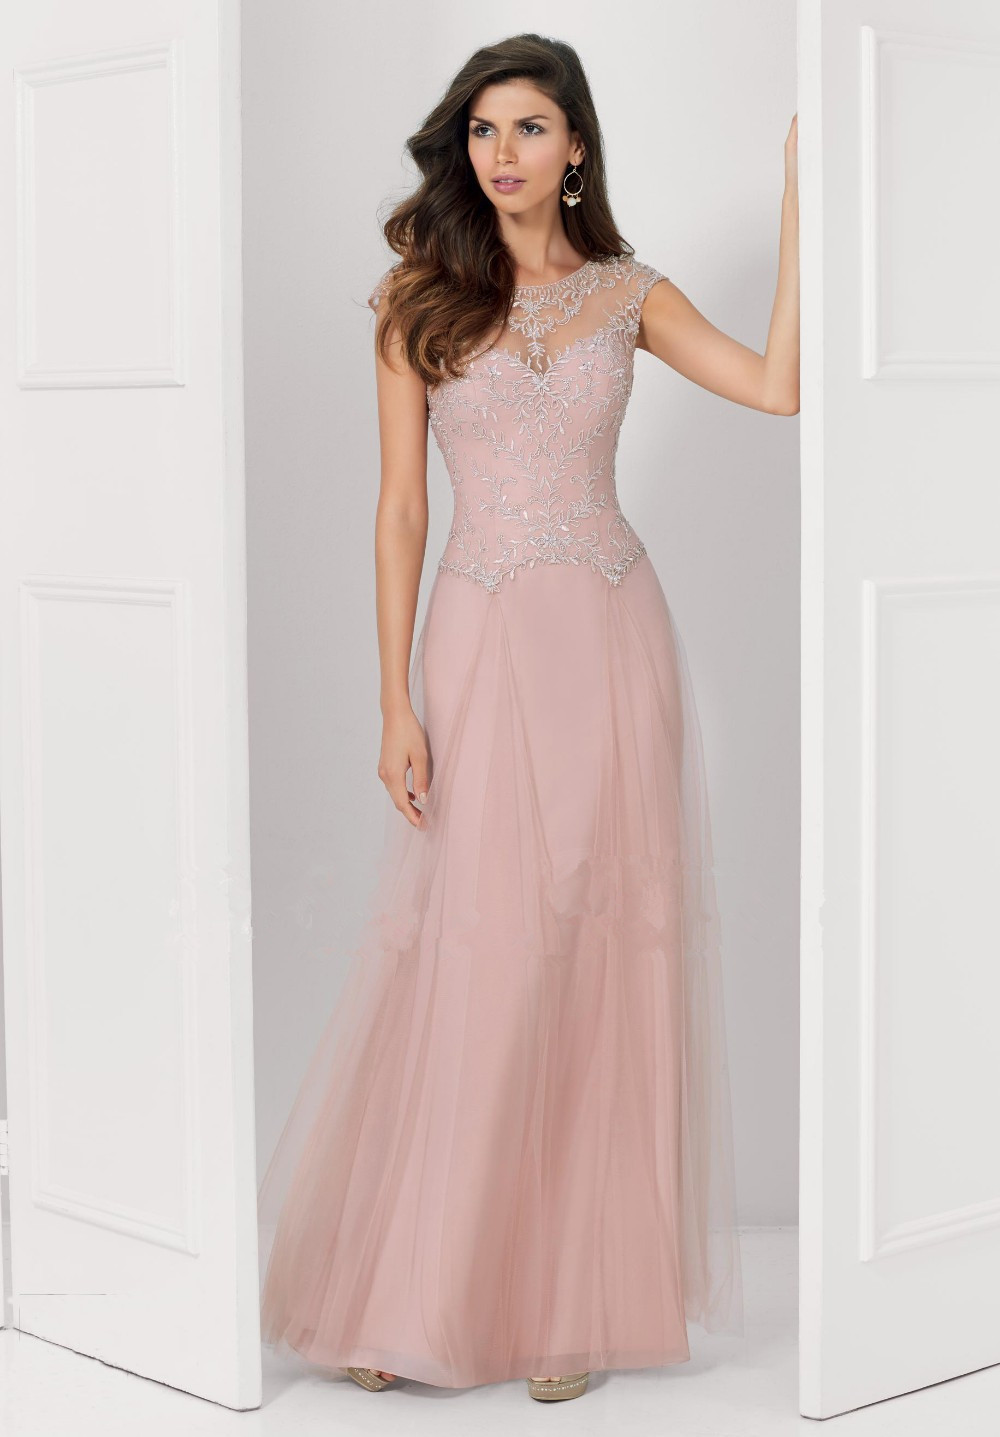 Simply Elegant Dresses | Wedding Tips and Inspiration